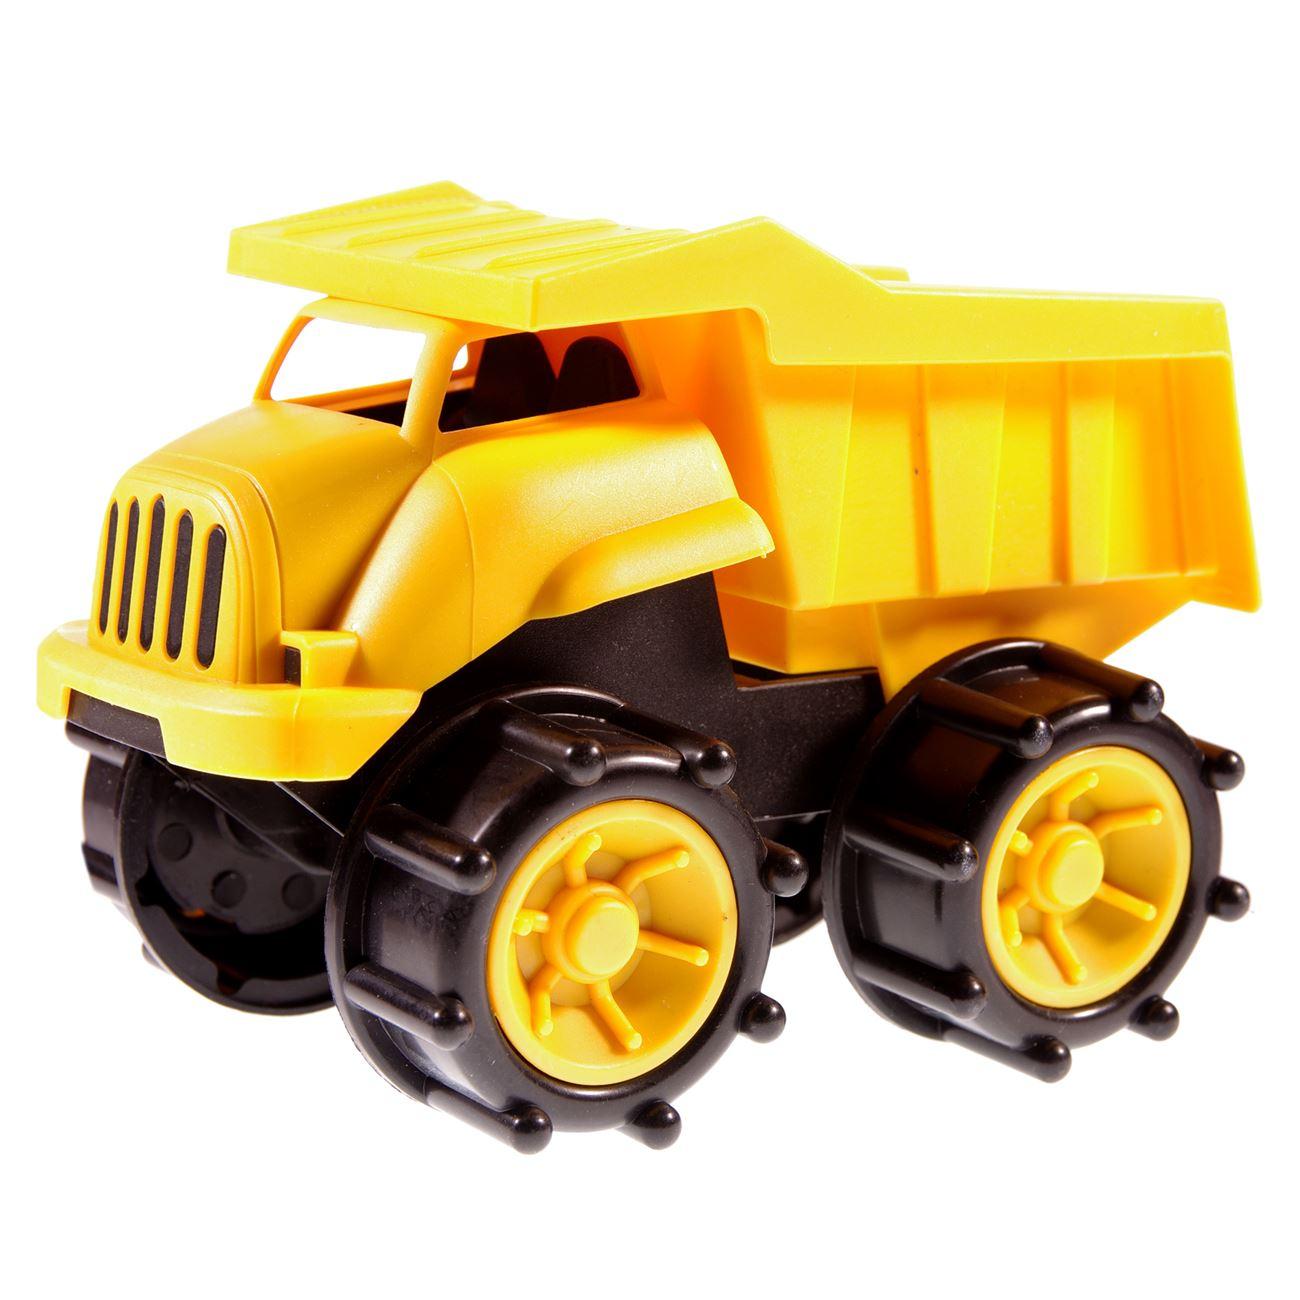 e60122e0219 Φορτηγό Ανατρεπόμενο Friction Κίτρινο 13 εκ. < Δομικά Οχήματα Προσχολικά    Jumbo